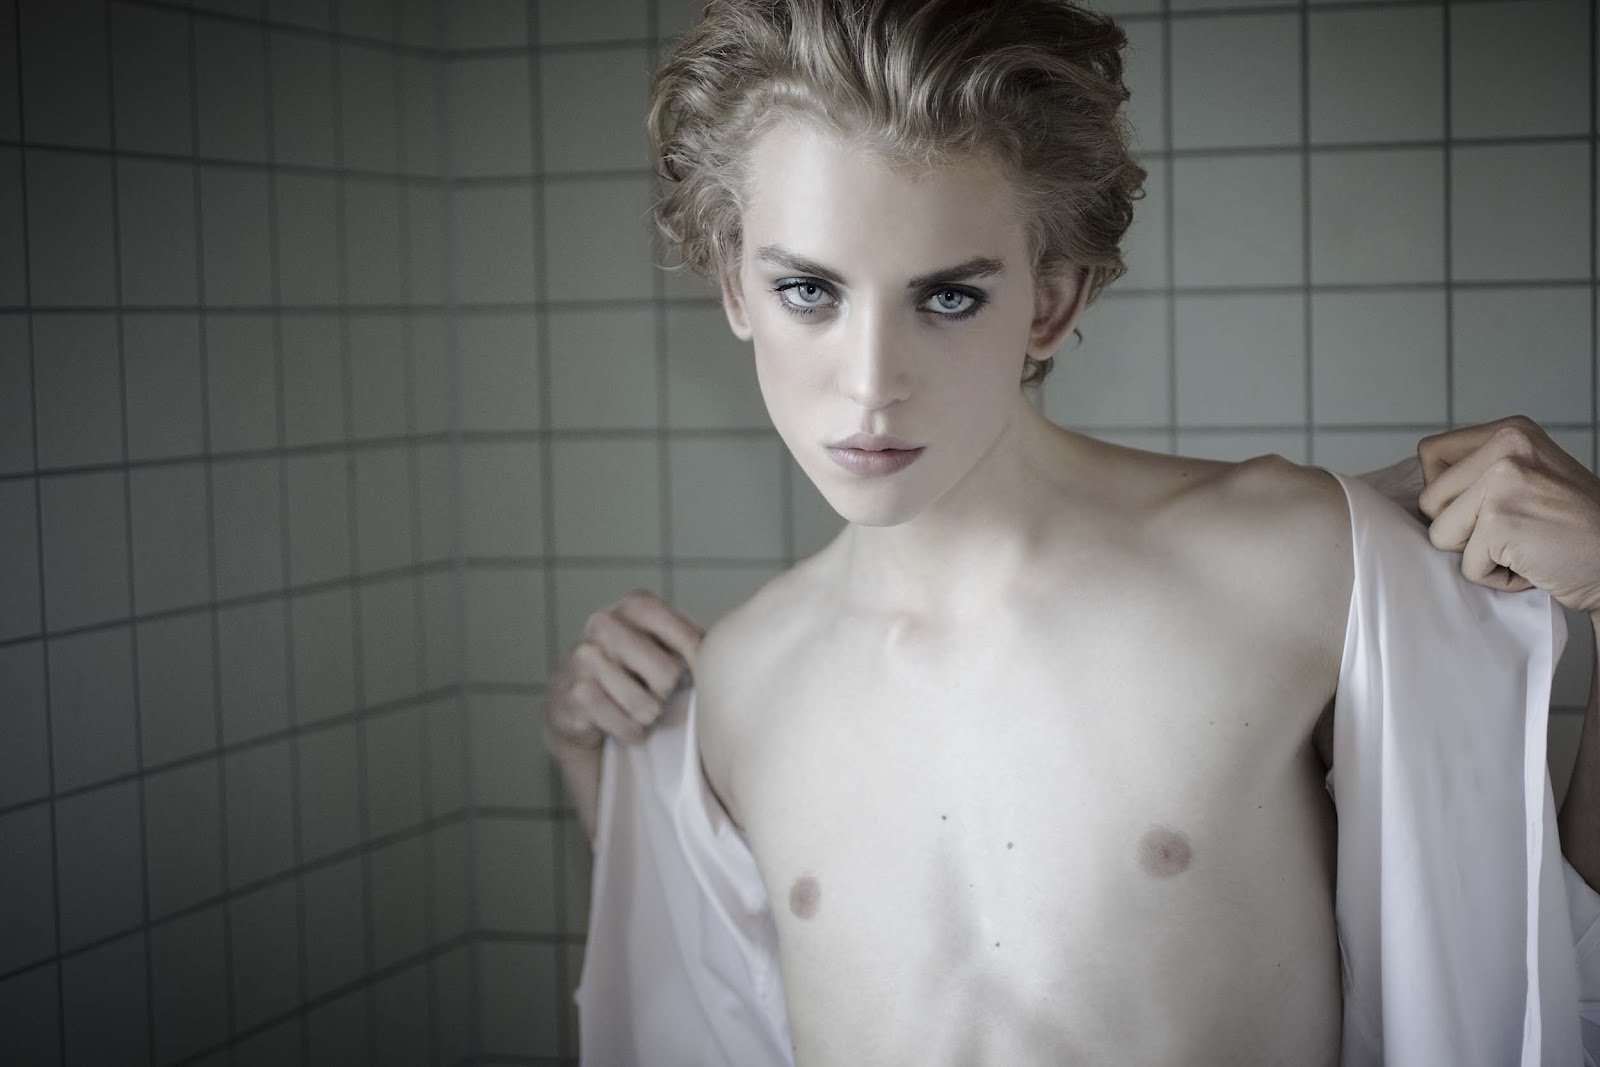 Синдром Морриса: мужчина, женщина или гермафродит?